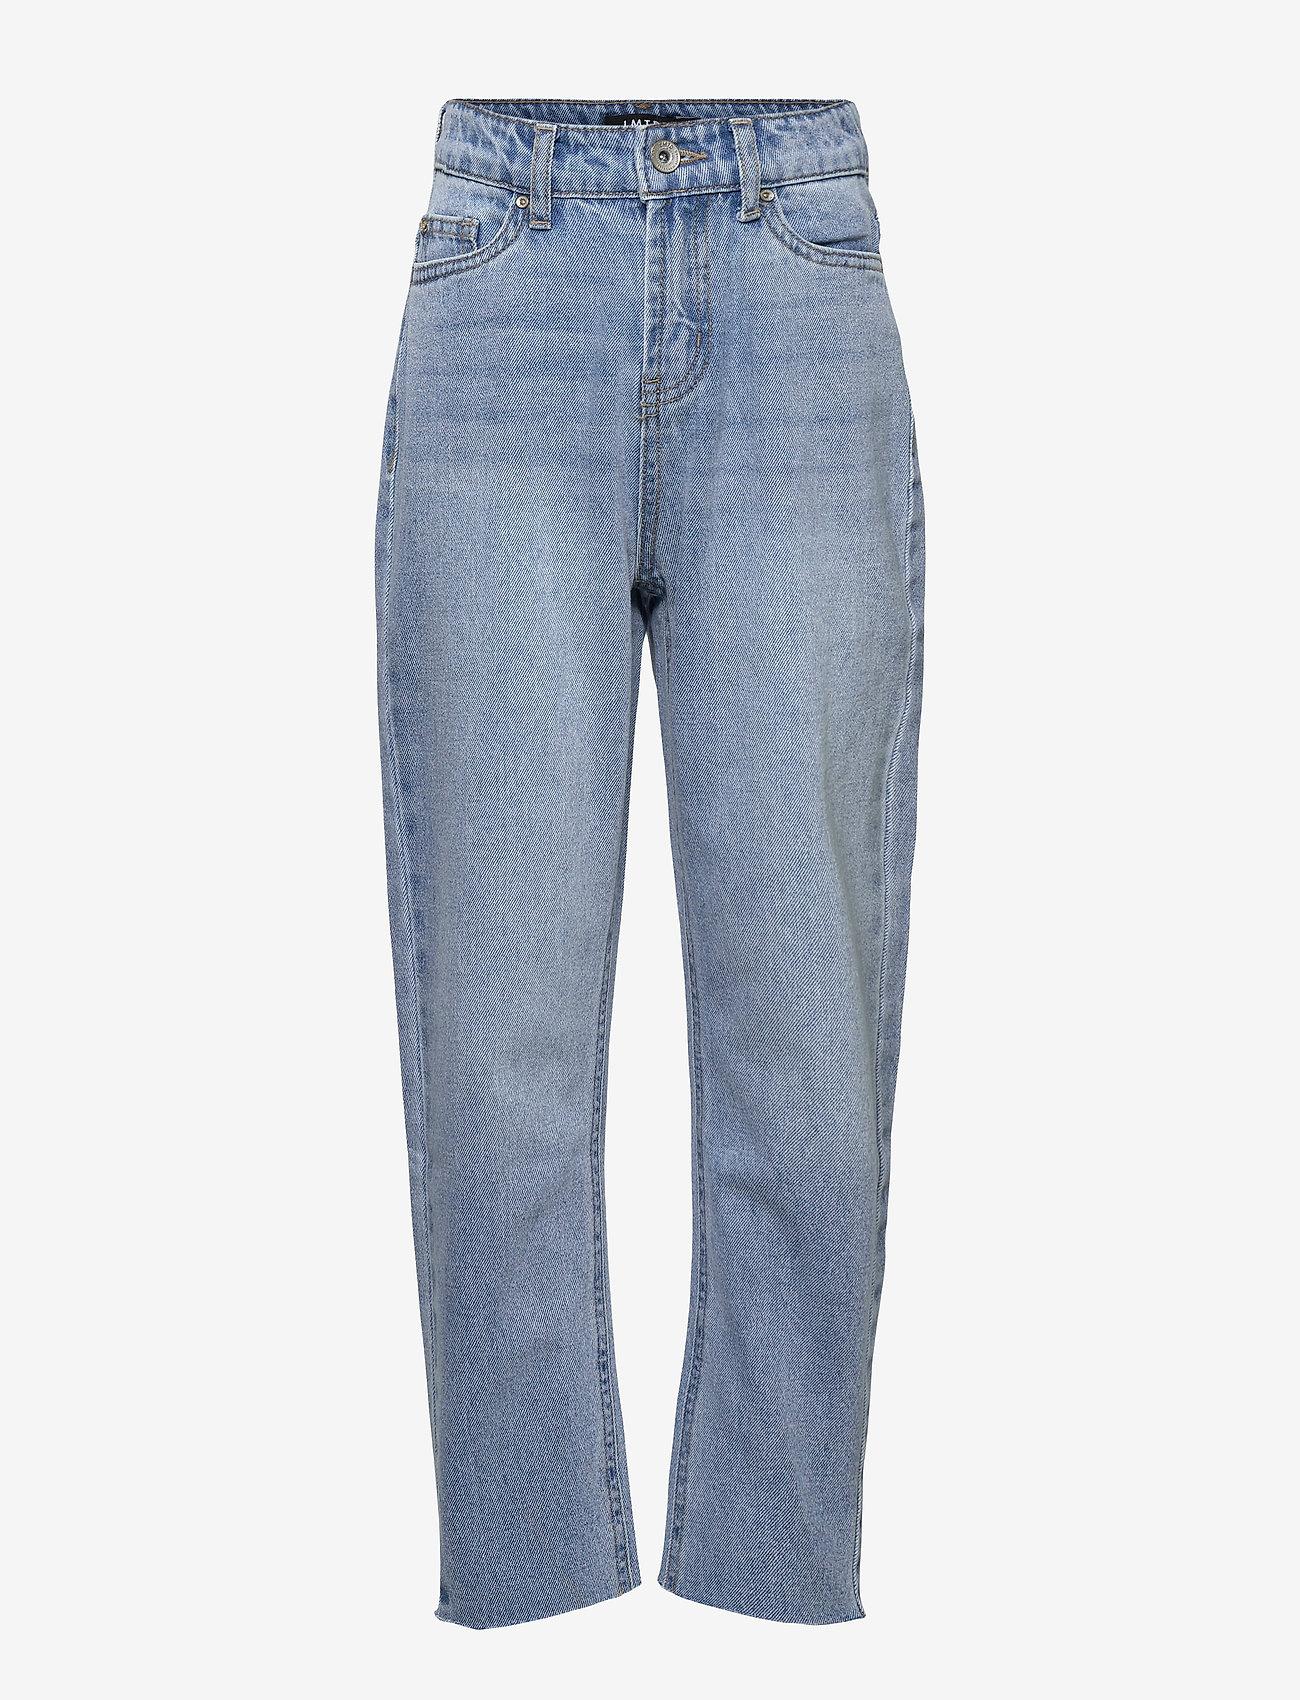 LMTD - NLFRAVEN DNMIZZA HW ANKLE  PANT L NOOS - jeans - light blue denim - 0